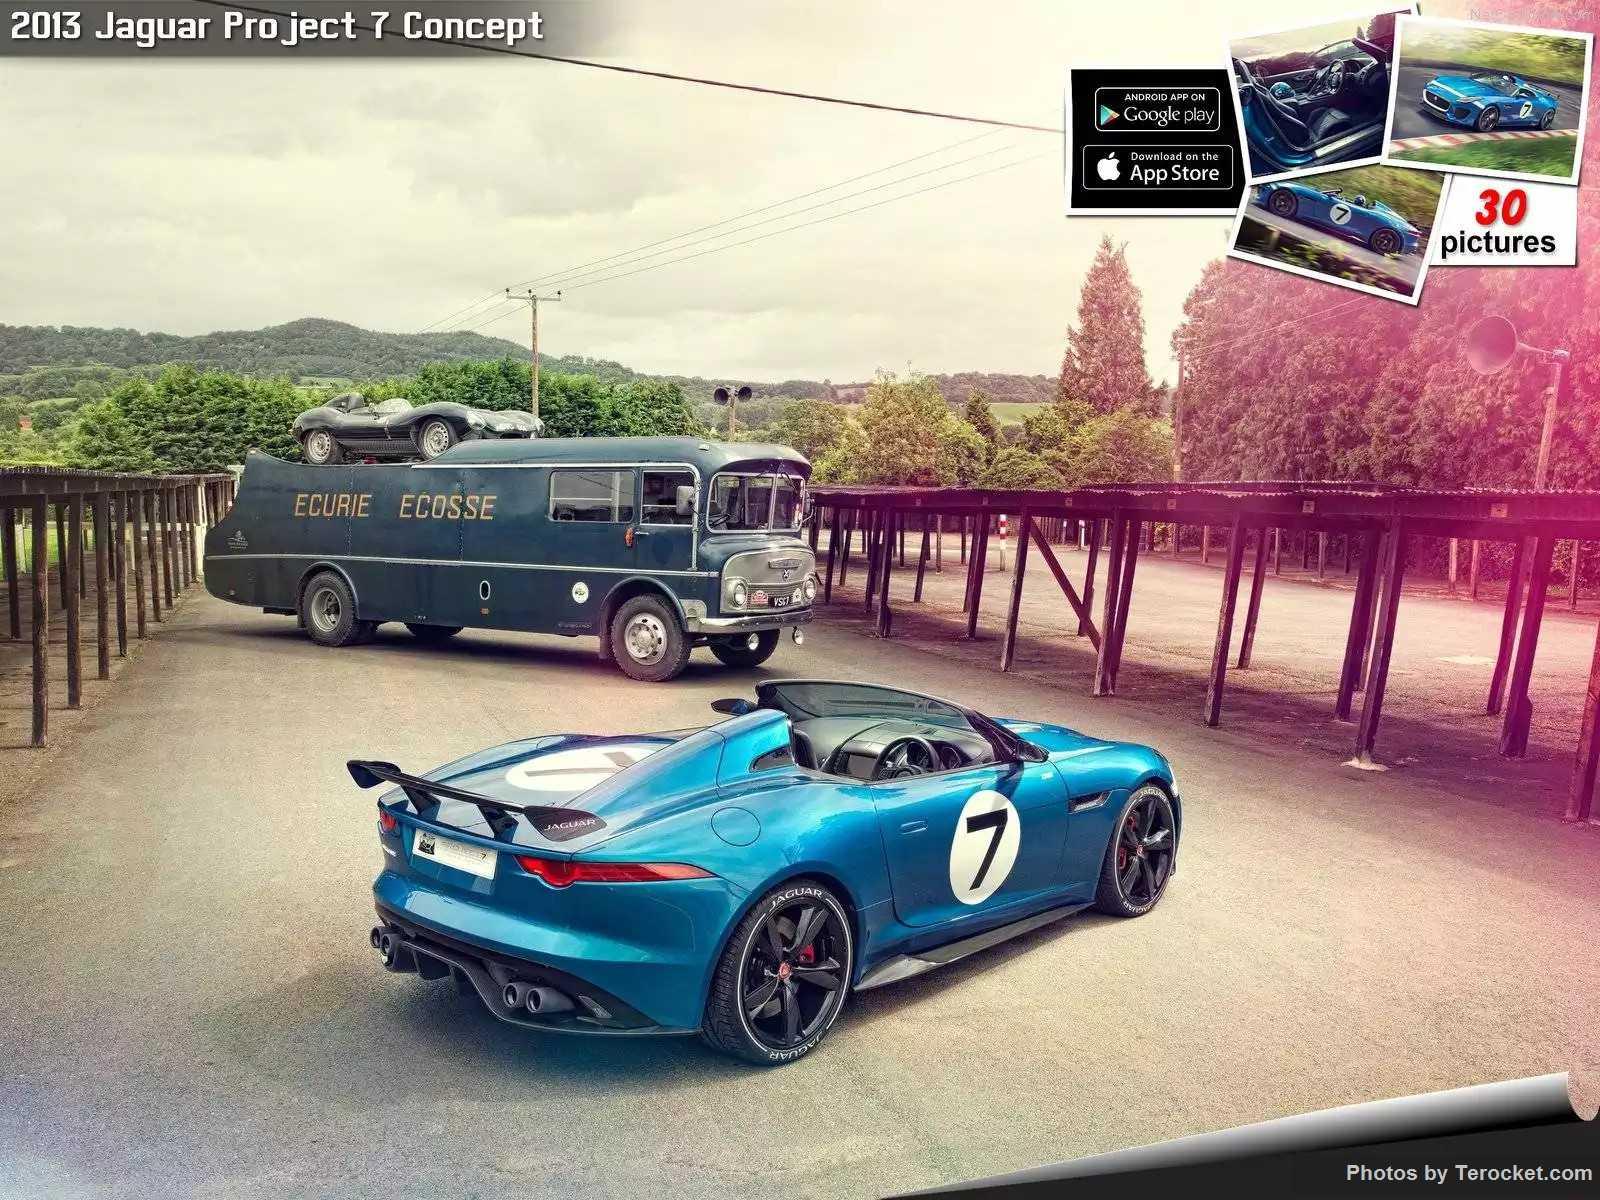 Hình ảnh xe ô tô Jaguar Project 7 Concept 2013 & nội ngoại thất